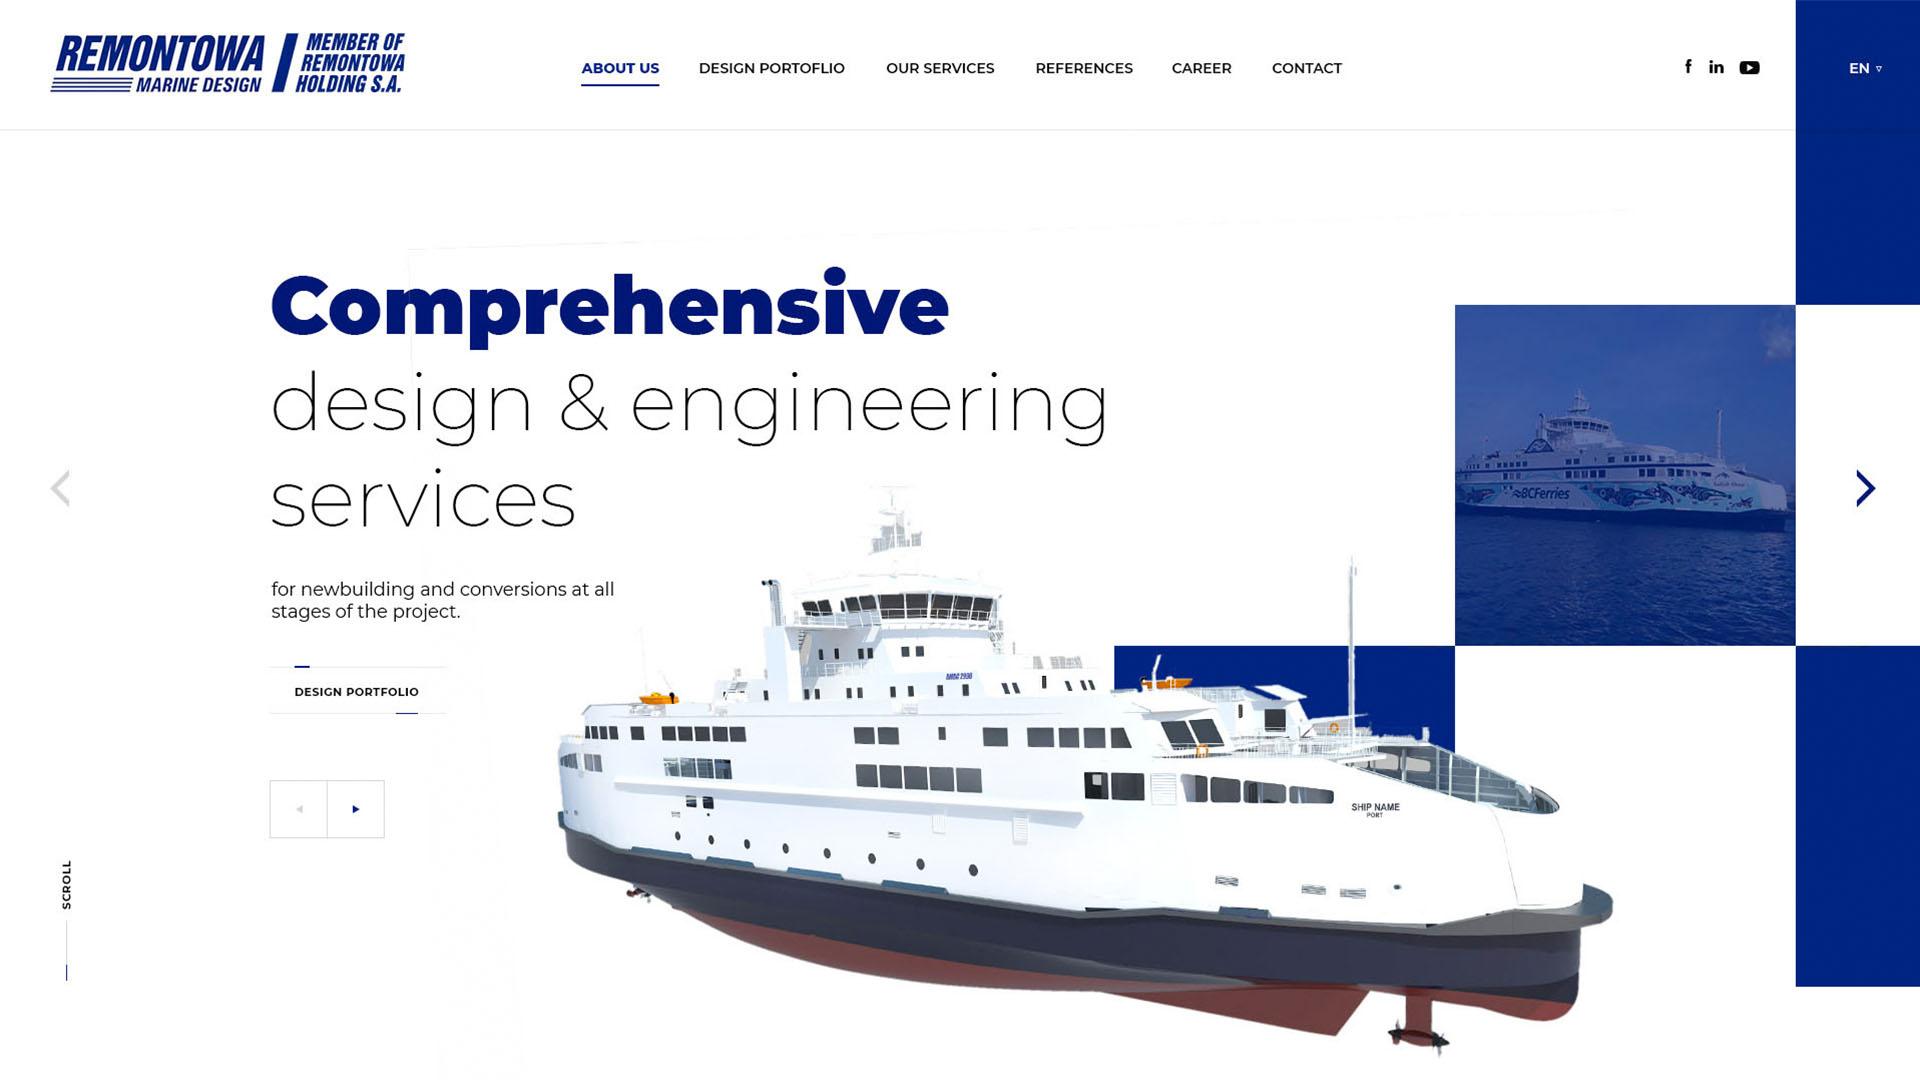 Remontowa Marine Desing & Consulting